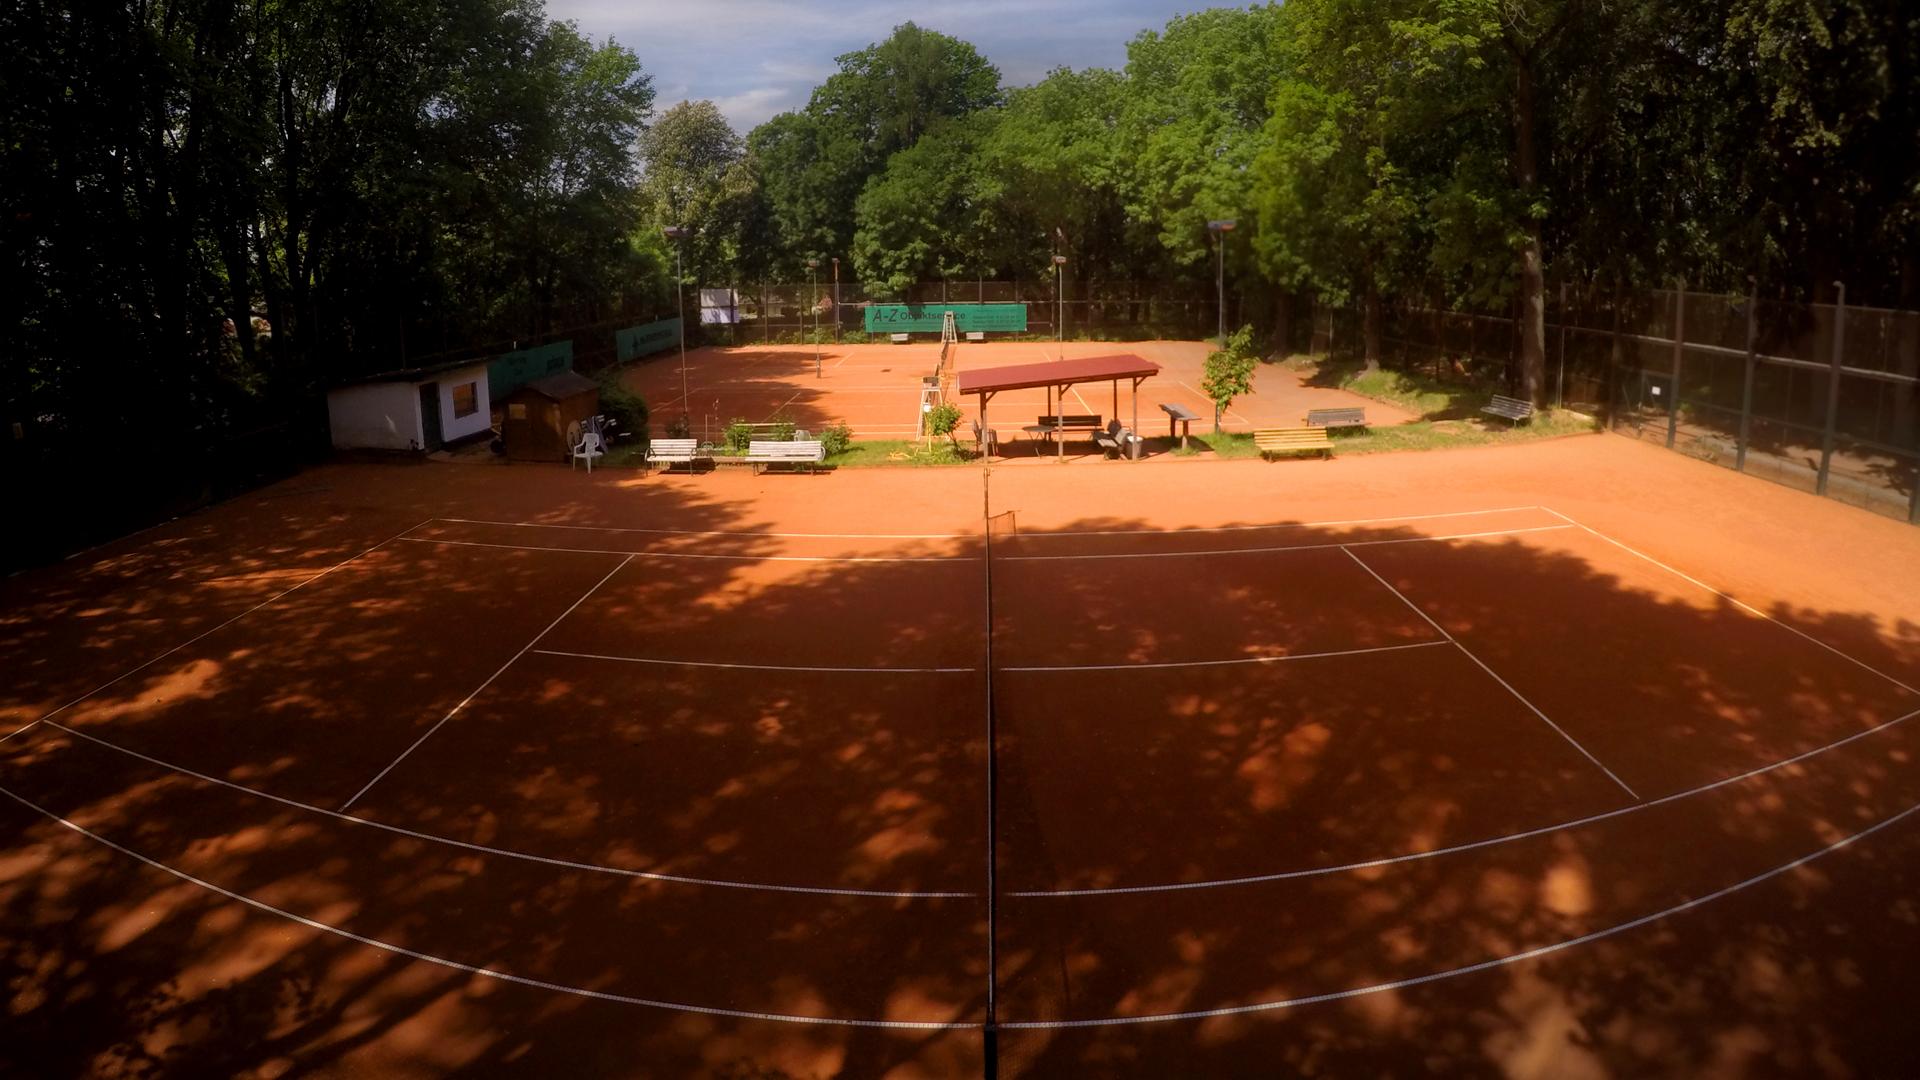 TC-Medizin-Berlin-Buch-tennisplatz-ABC00gp